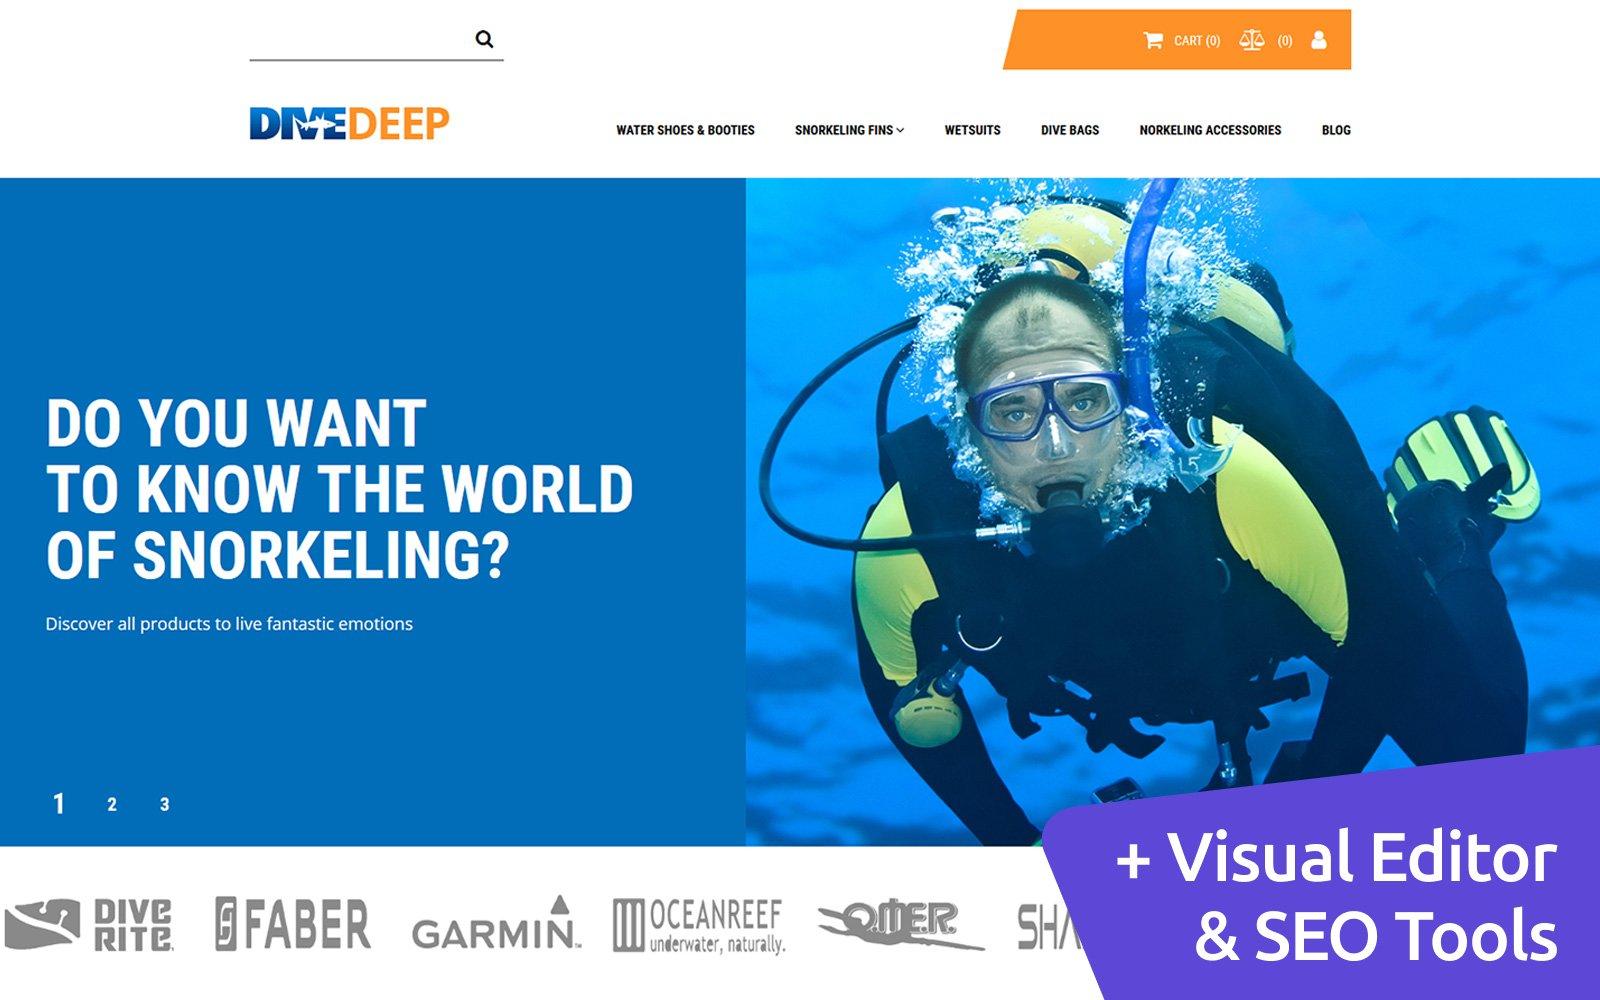 DiveDeep - Snorkeling Gear Store Template Ecommerce MotoCMS №71469